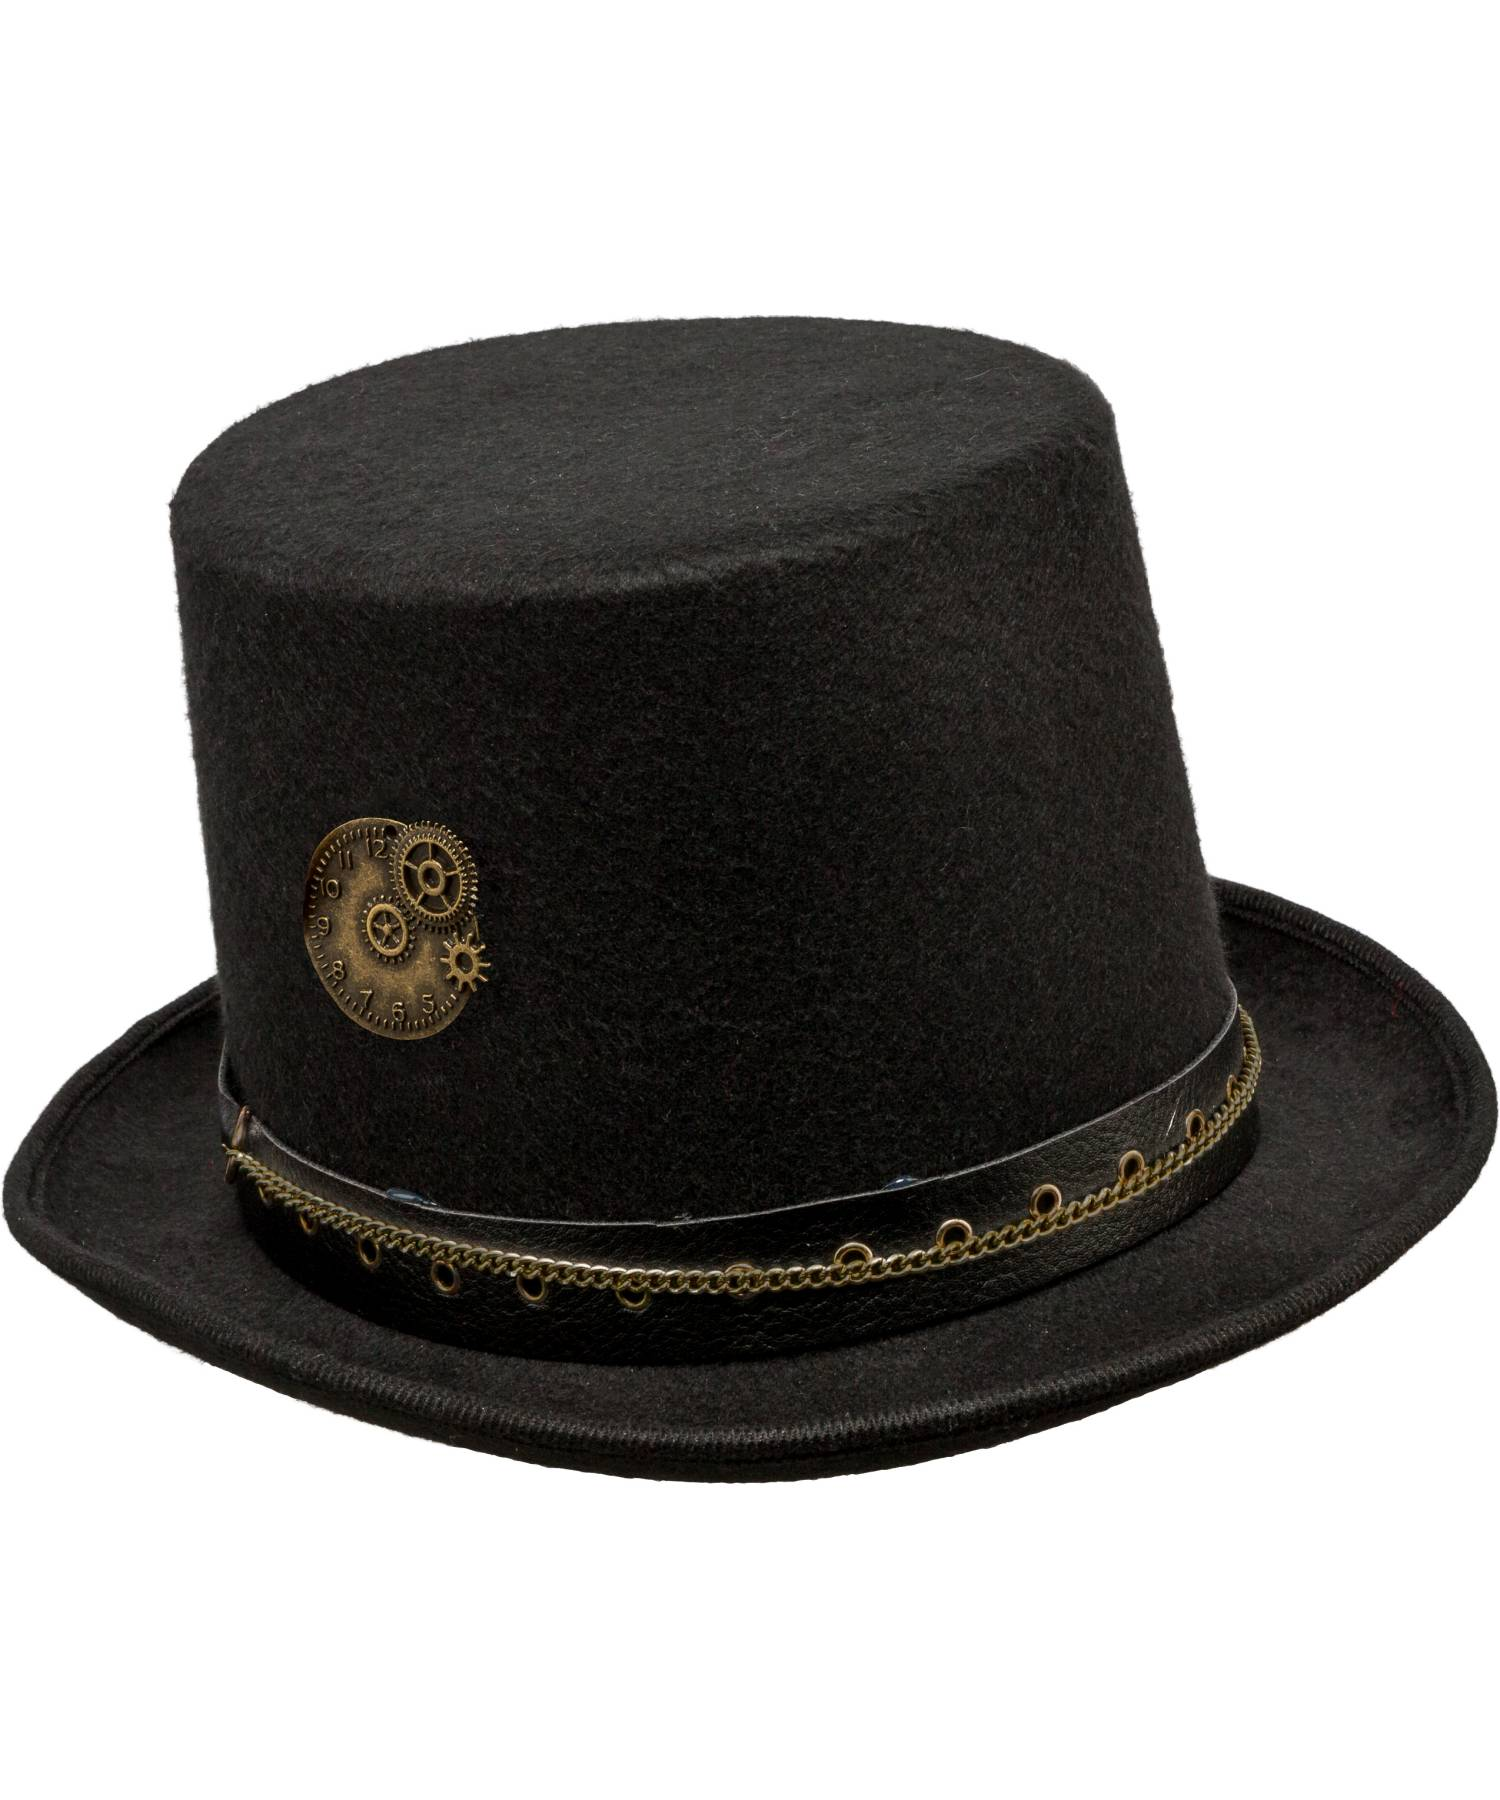 Chapeau-Steampunk-noir